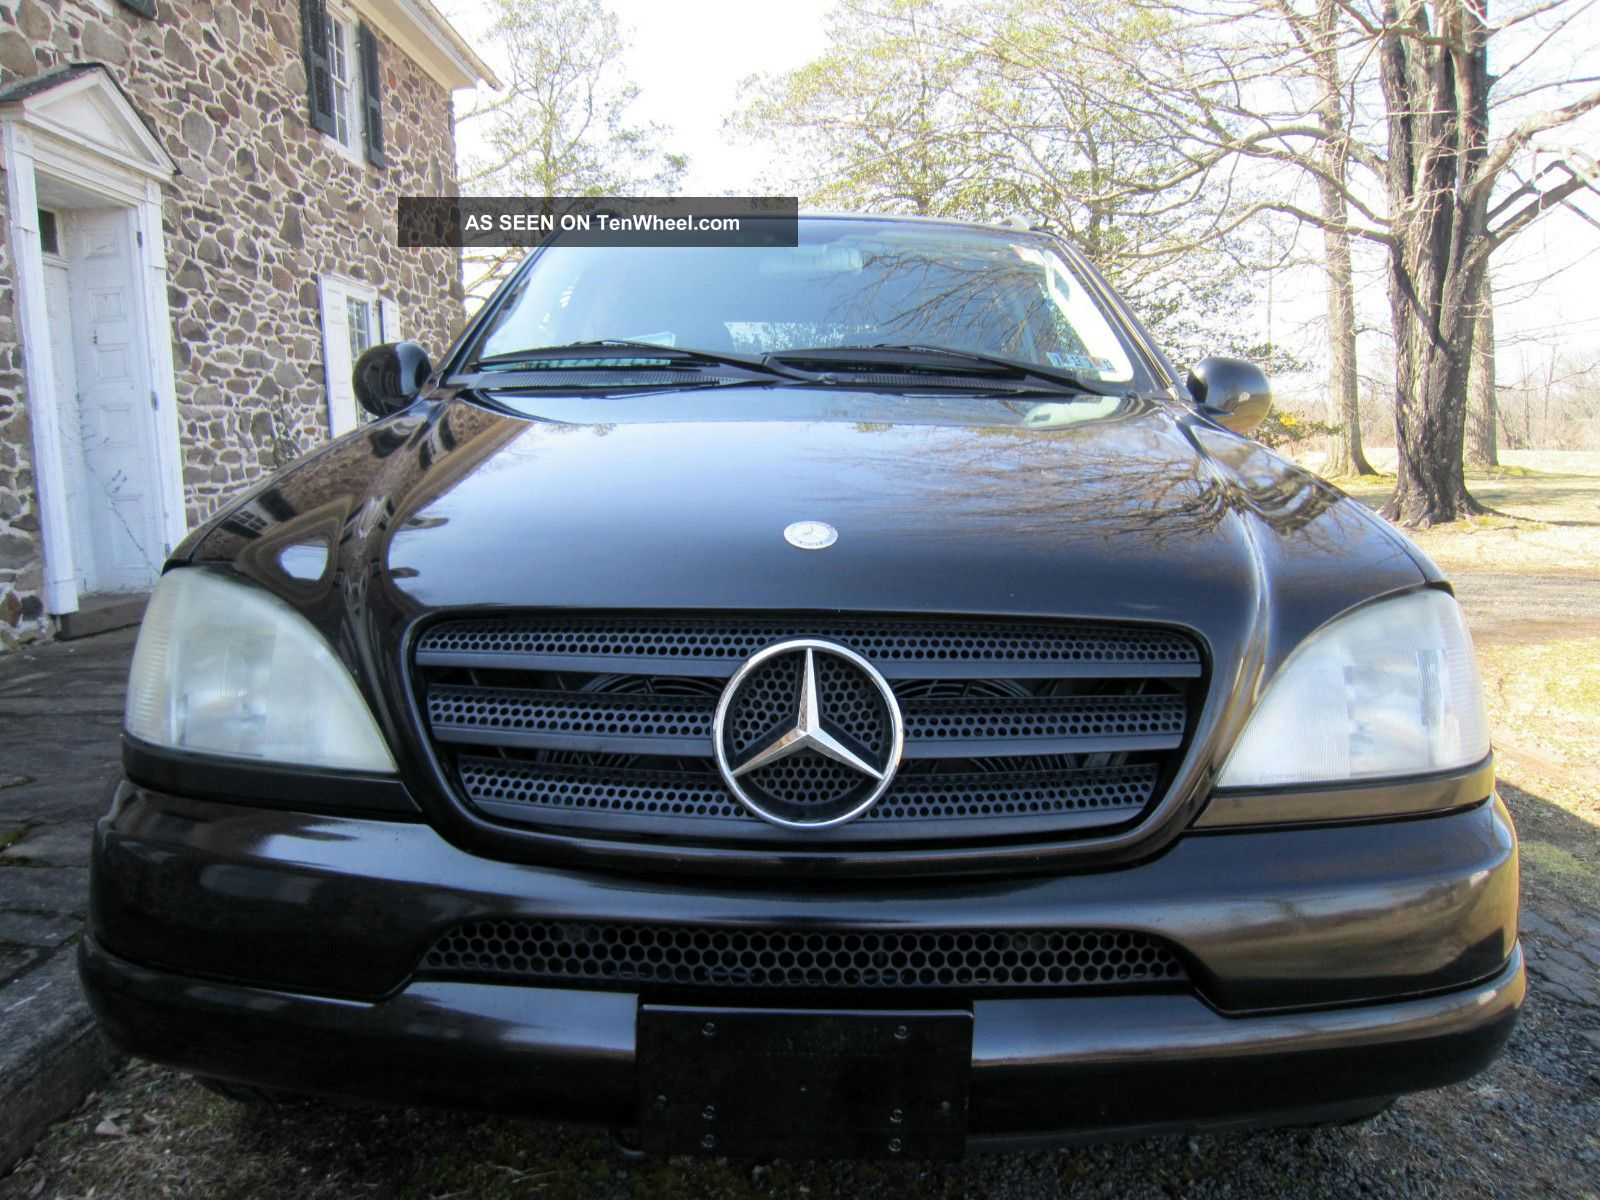 2001 mercedes benz ml430 base sport utility 4 door 4 for Mercedes benz ml430